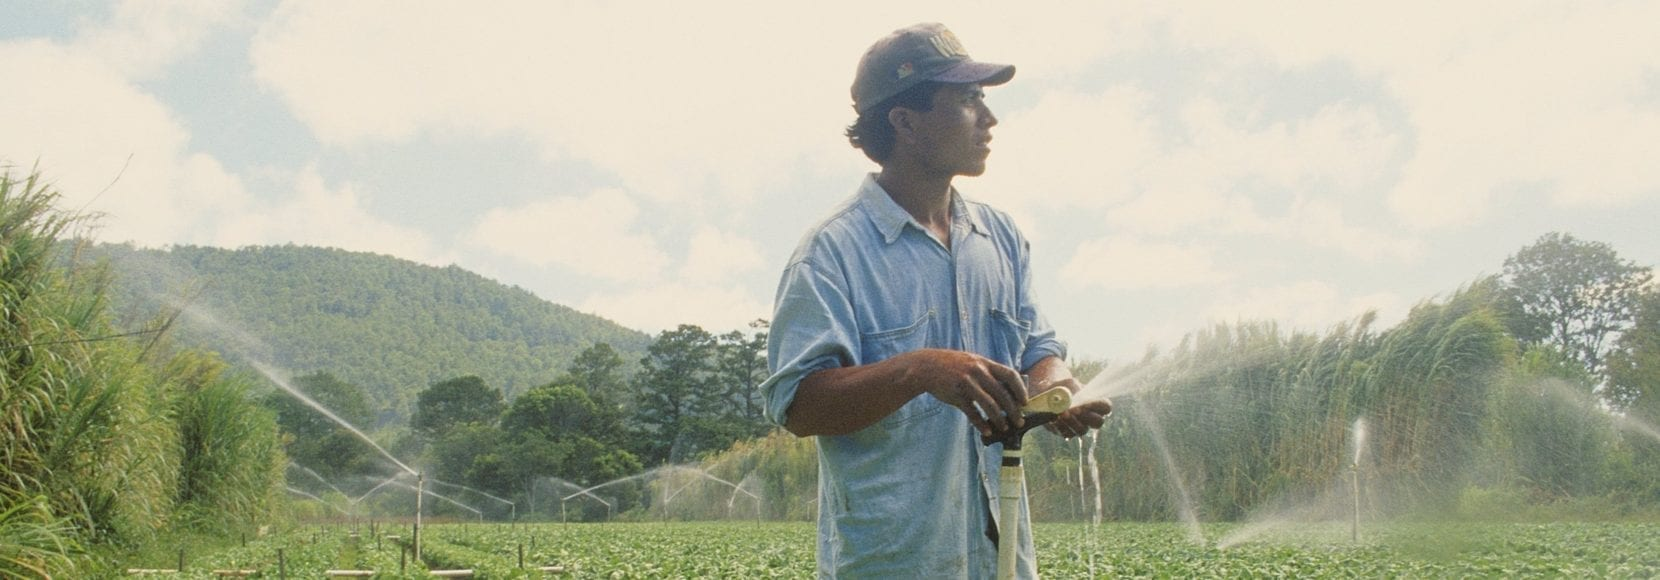 farmer irrigates crops